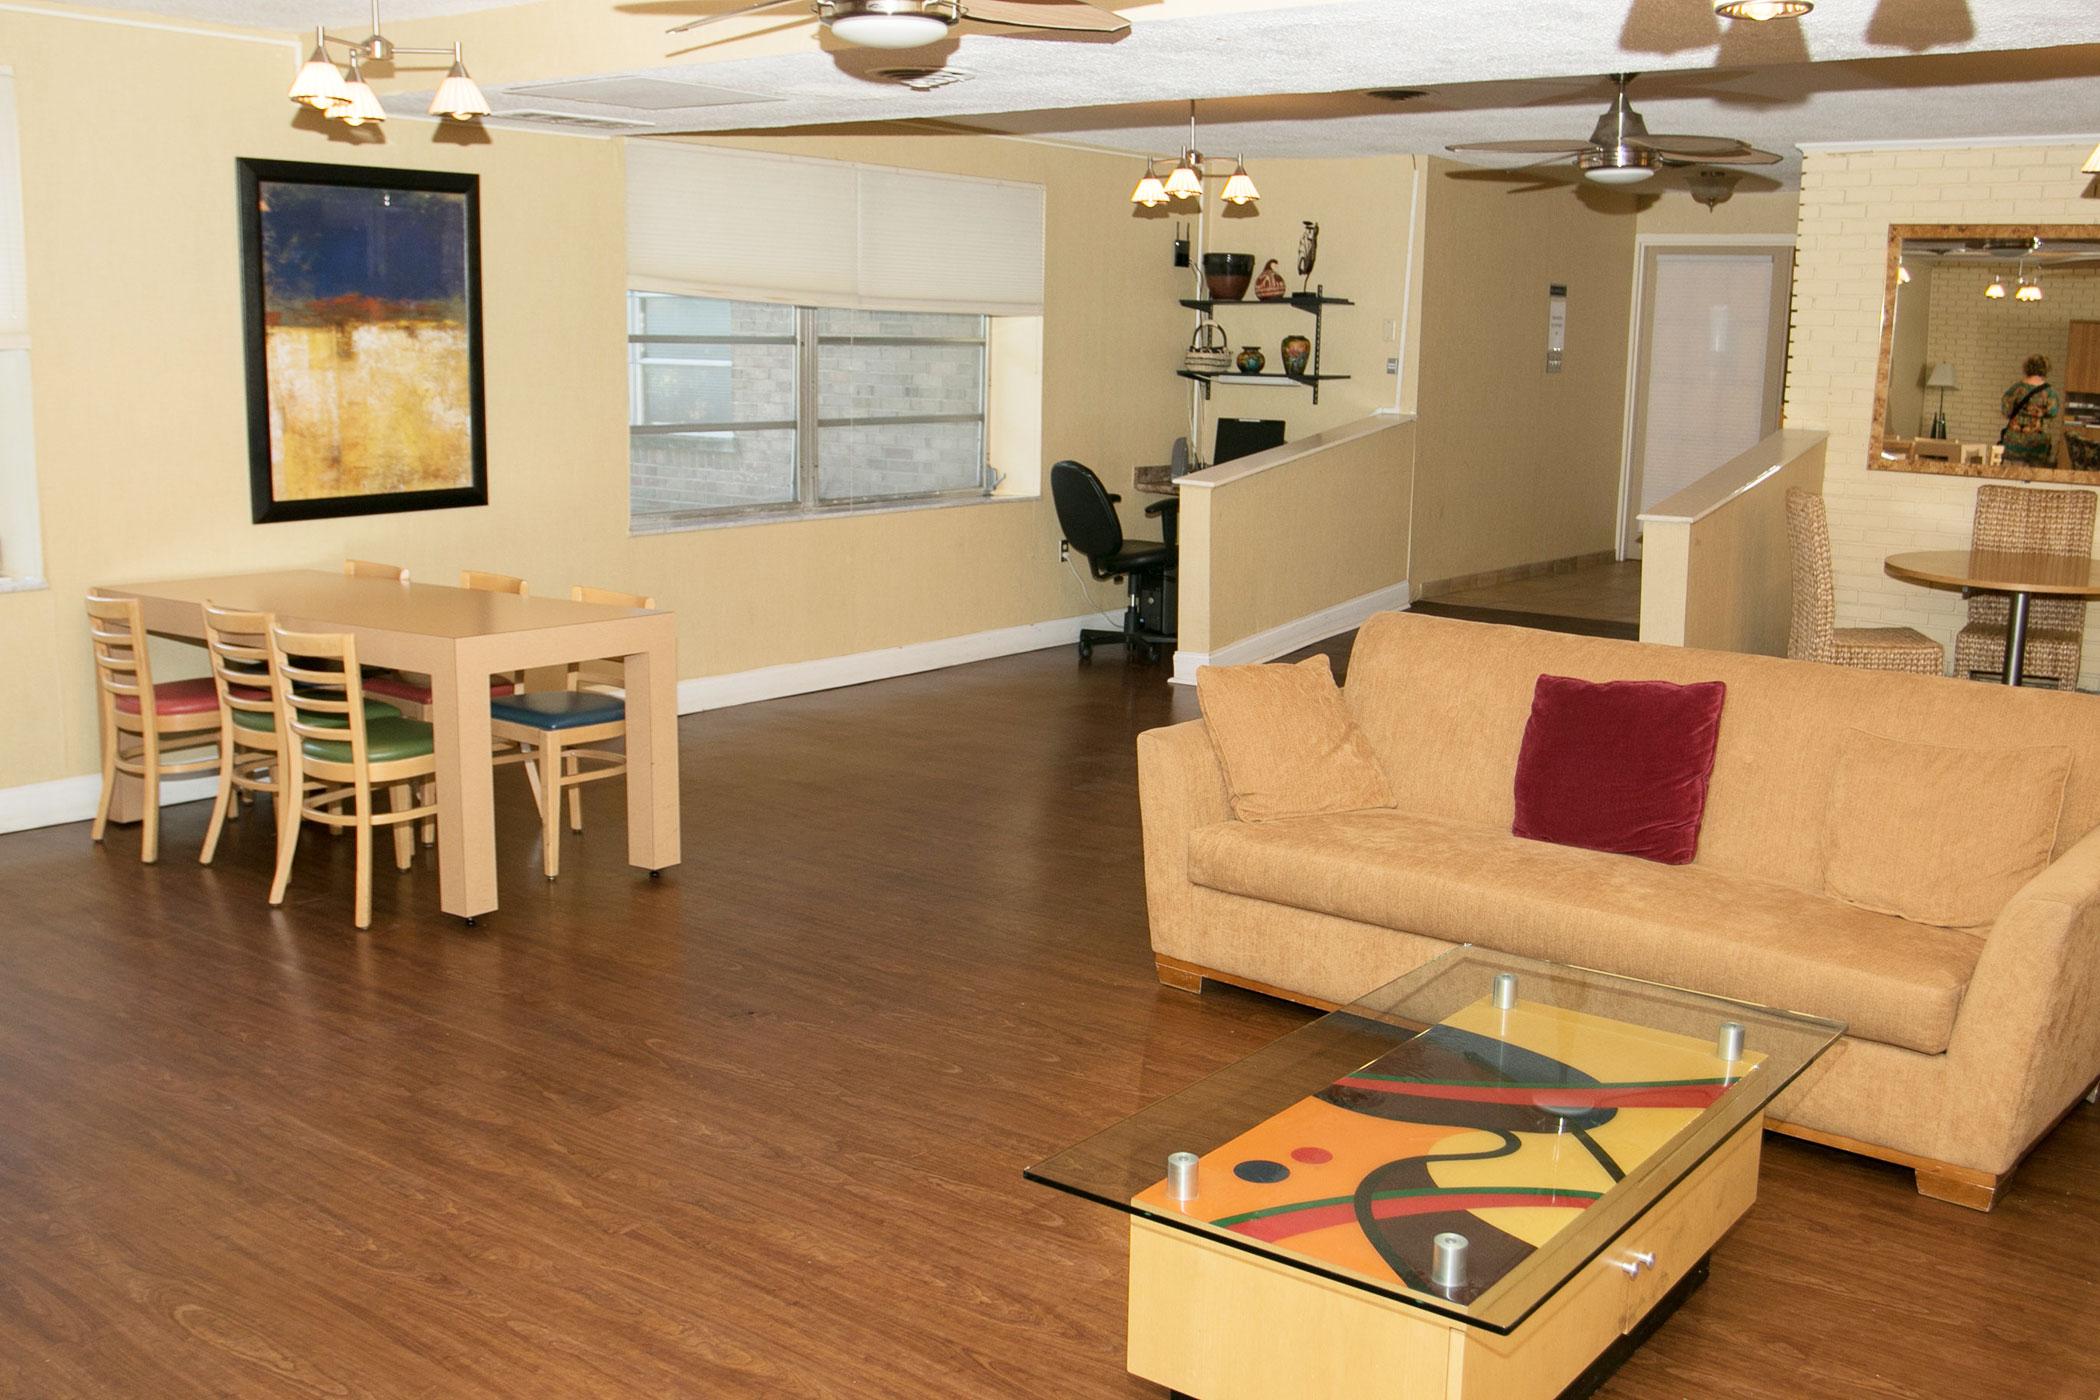 Party Rooms For Rent In Cincinnati Oh